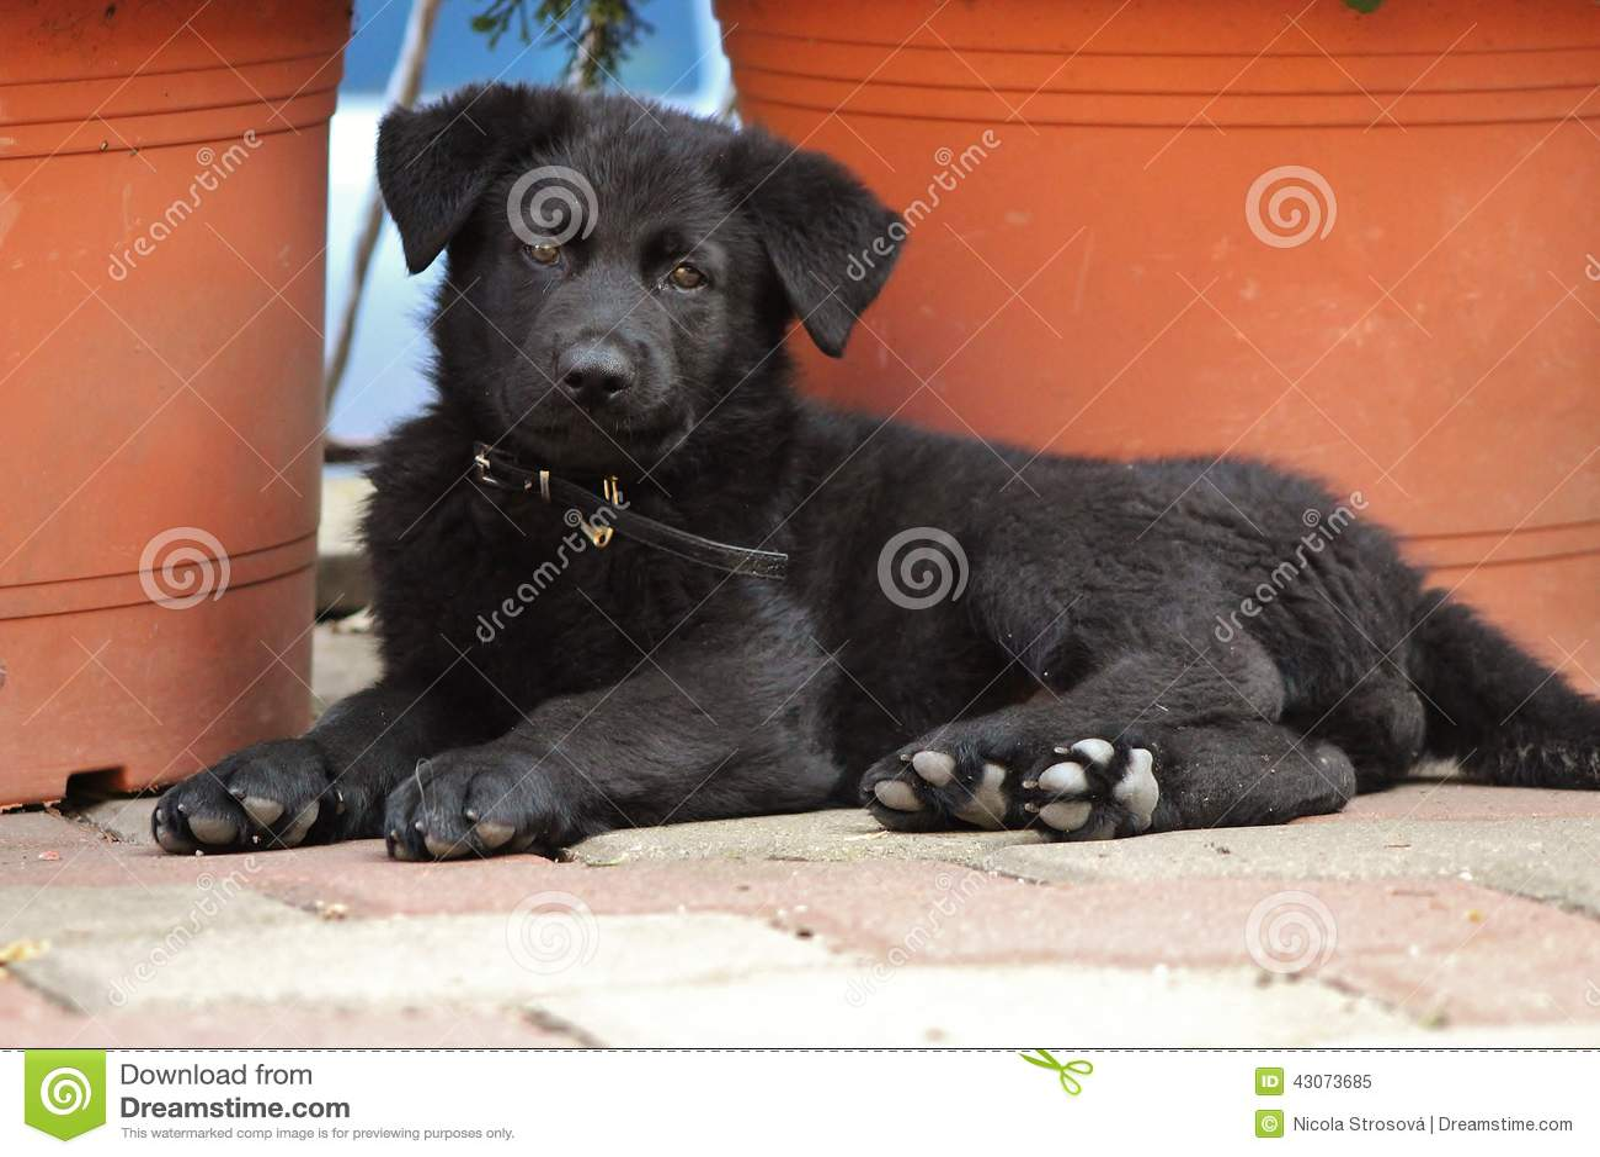 Black German Shepherd Puppy Stock Image Image Of Months Puppy 43073685